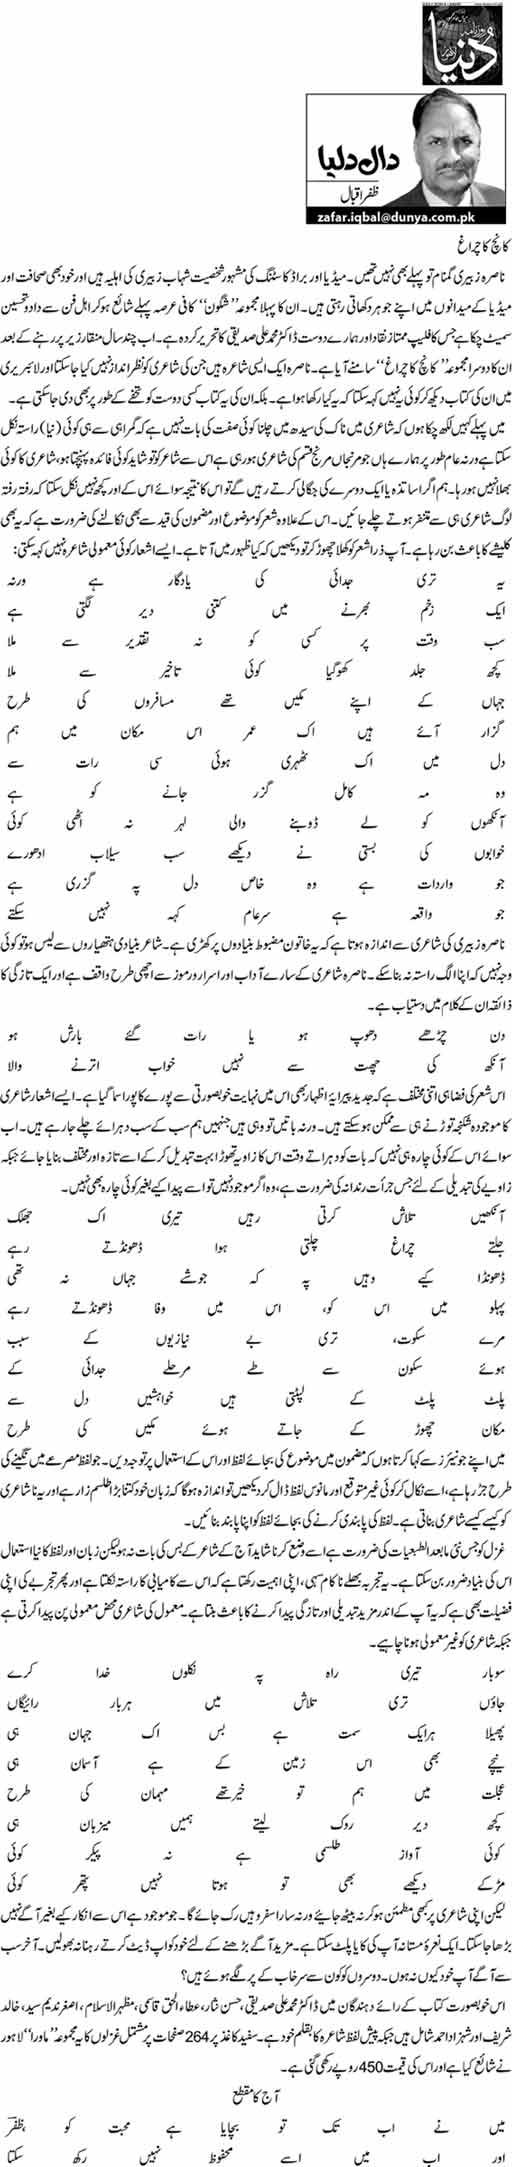 Kanch ka charagh - Zafar Iqbal